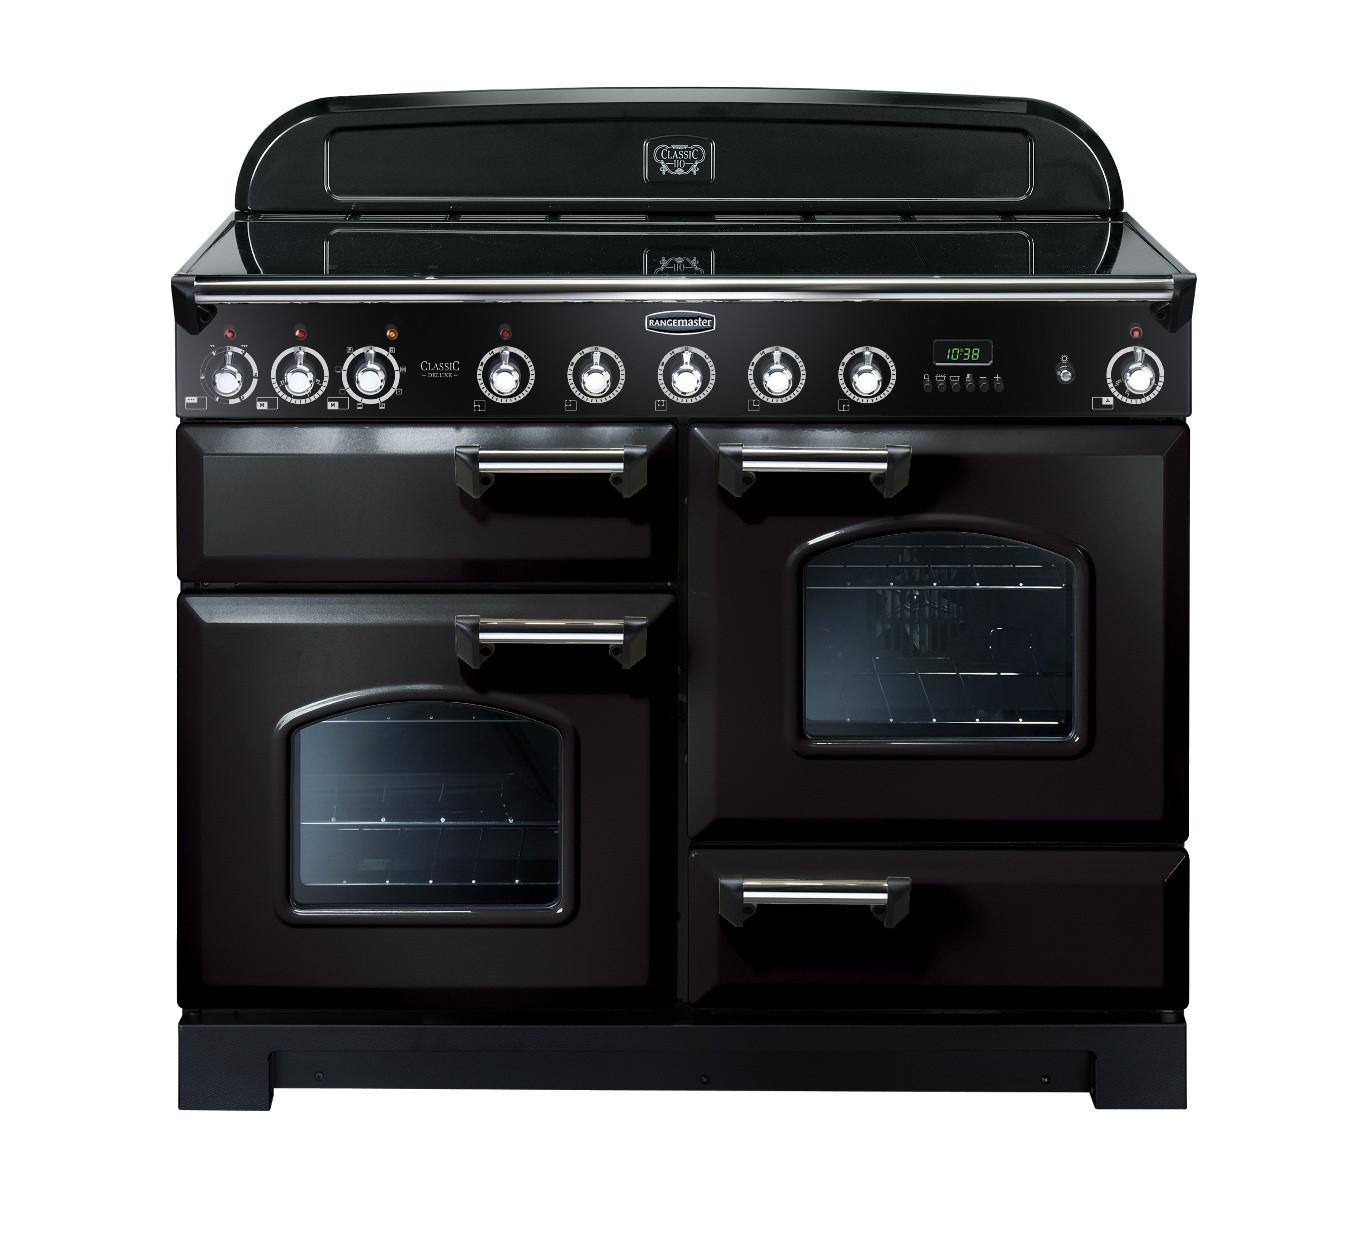 Rangemaster Classic Deluxe 110 Induction Range Cooker Black/Chrome 90380